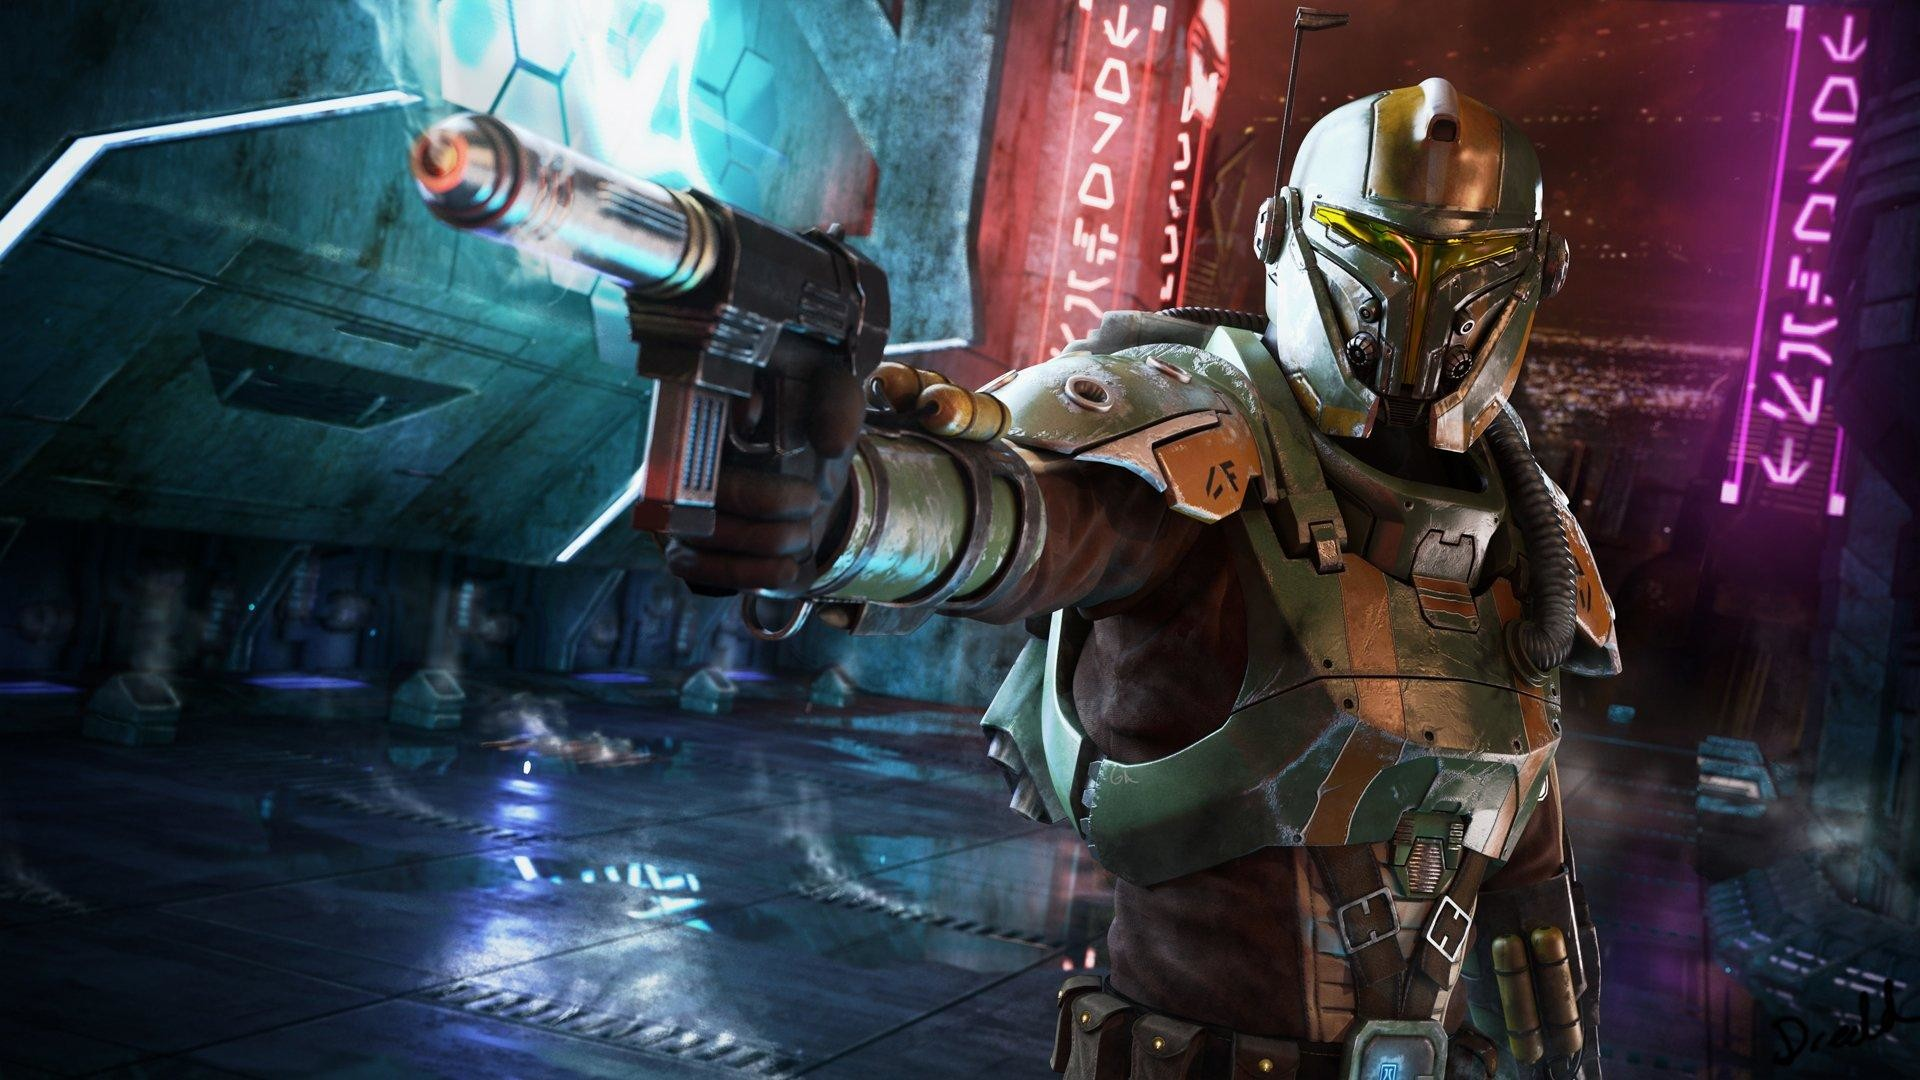 wallpaper.wiki-Clone-Wars-Background-Free-Download-PIC-